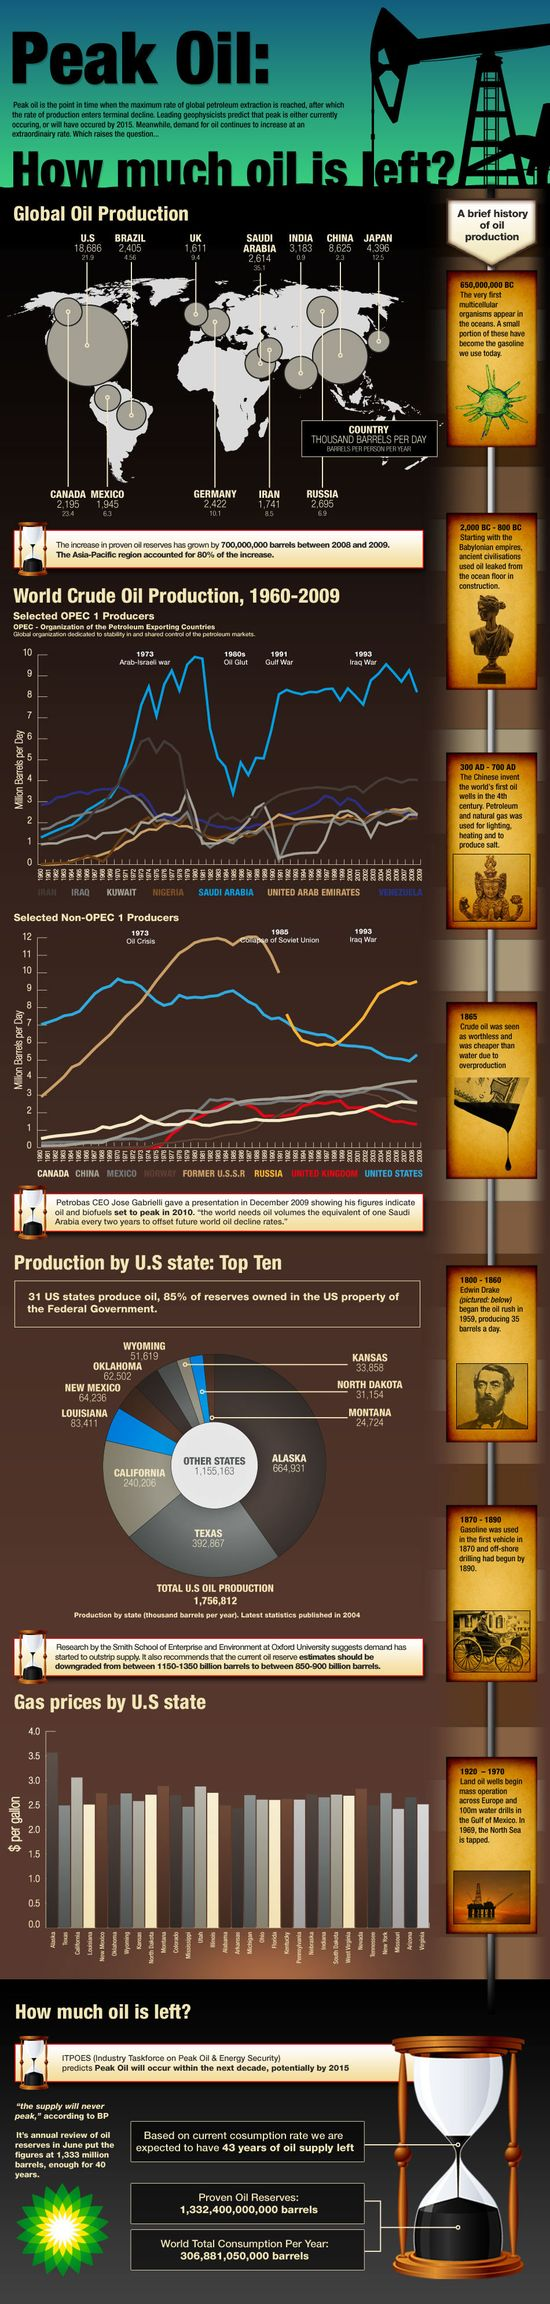 Peak Oil - How Much Oil Is Left